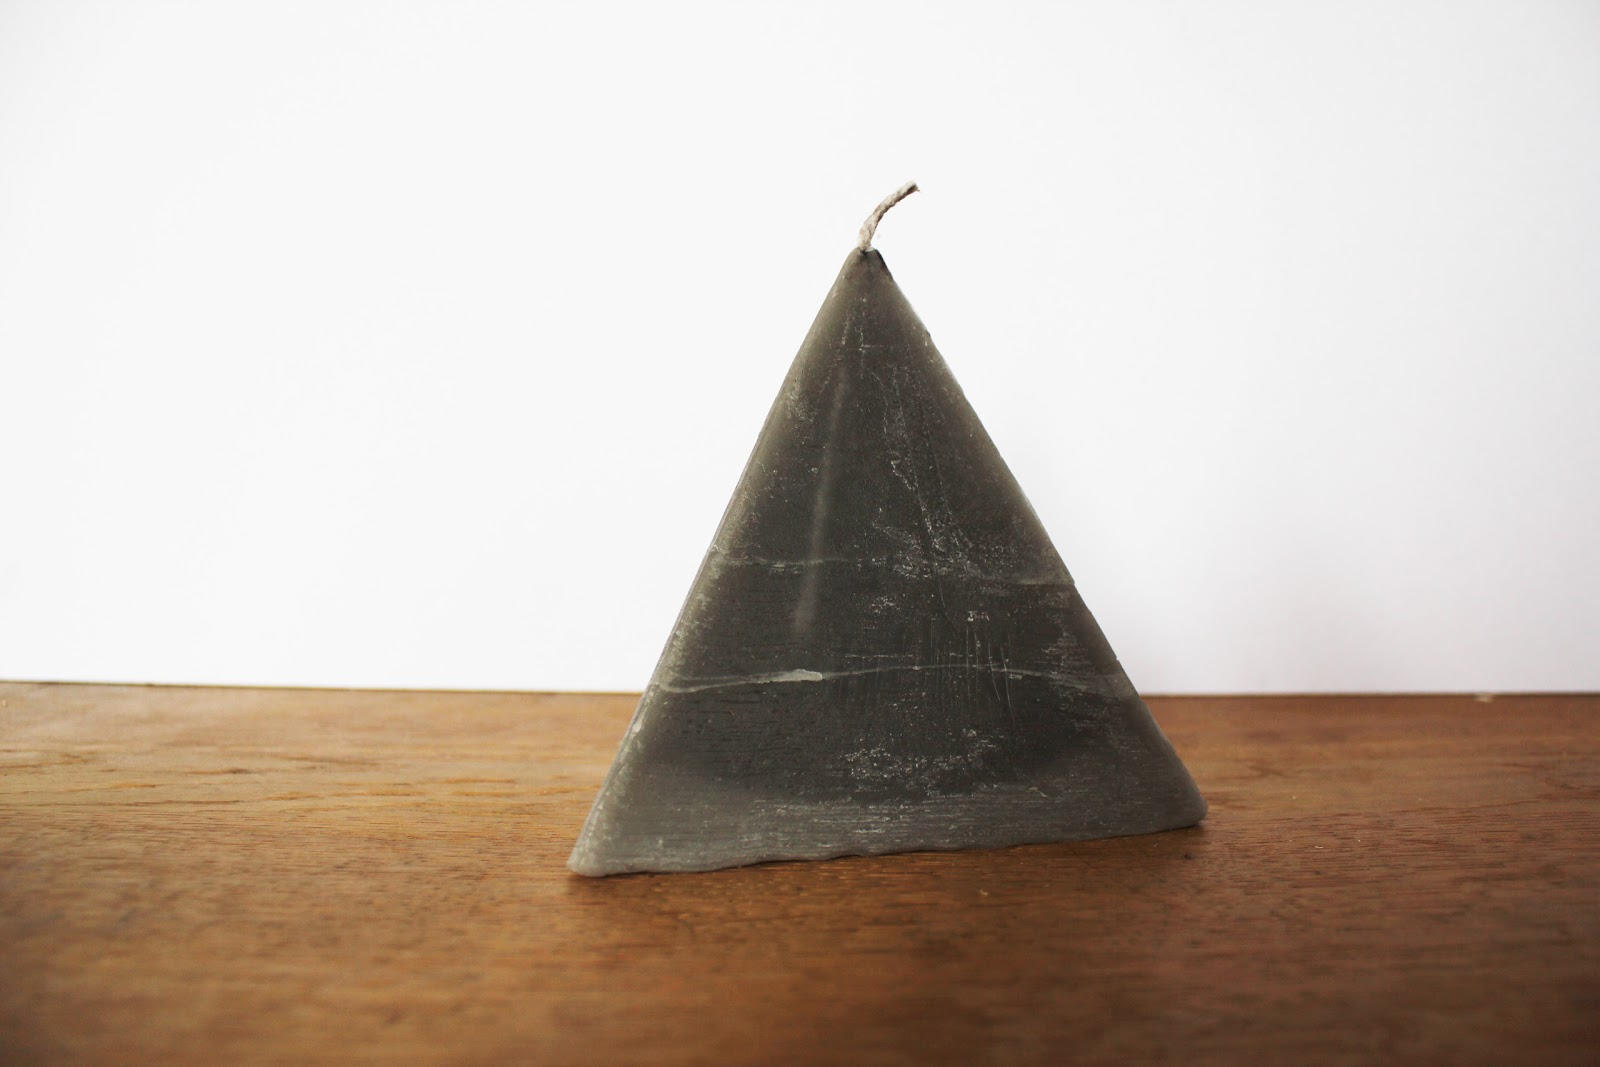 diy pyramid candle minimal crafts